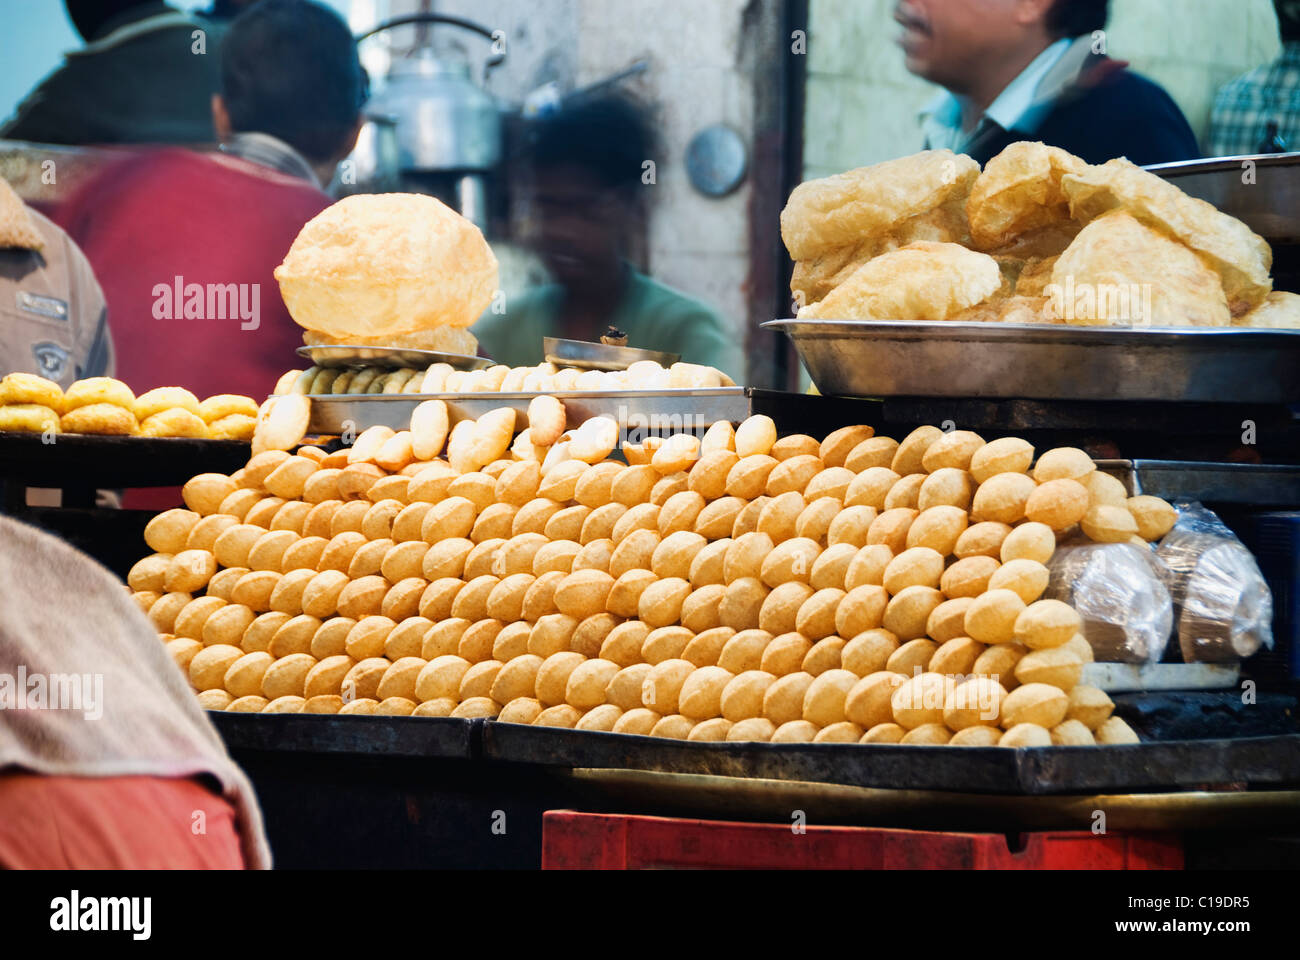 Snacks at a food stall, Haridwar, Uttarakhand, India - Stock Image